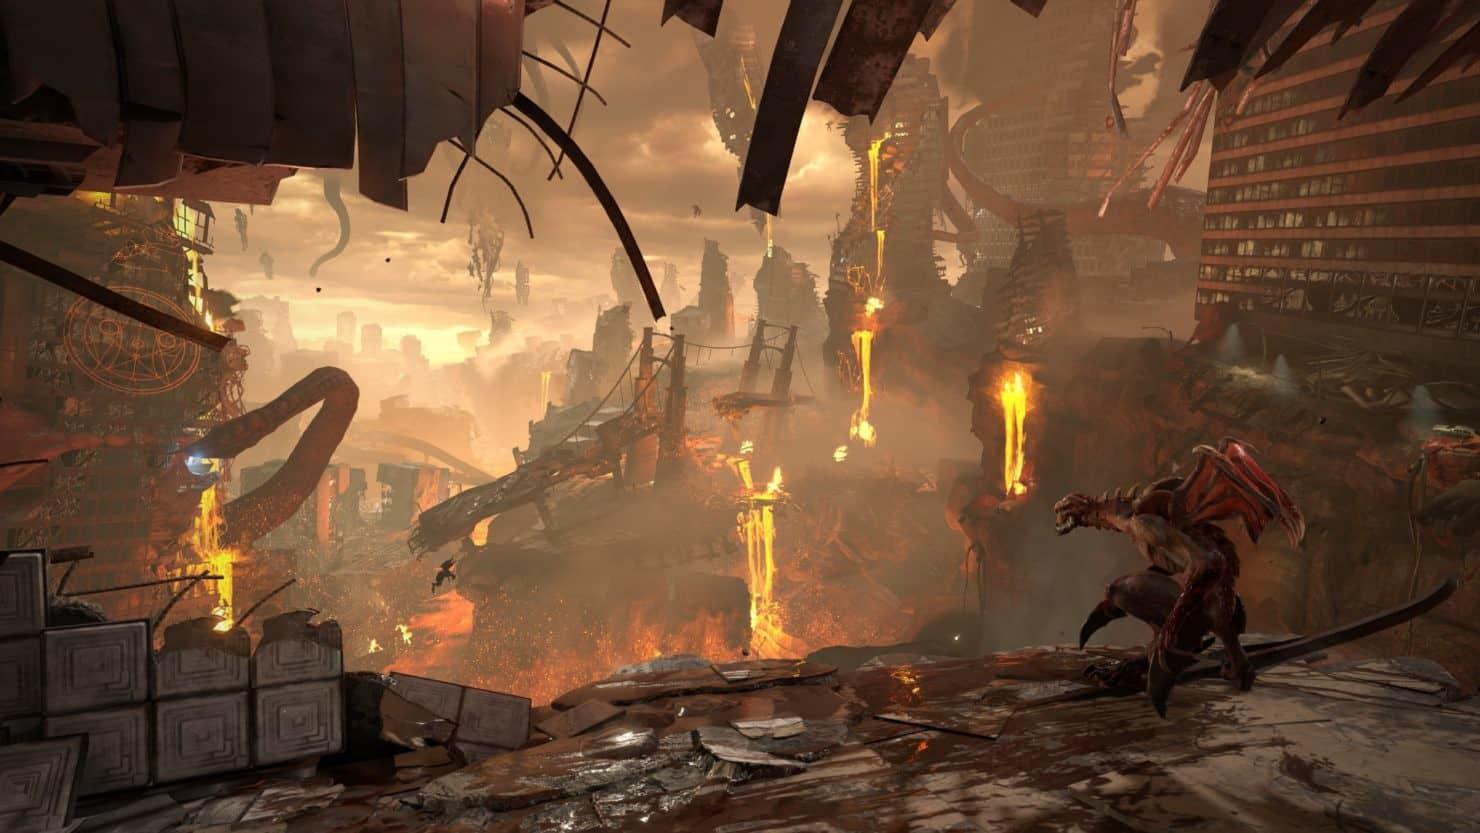 doom eternal 11 - DOOM Eternal - Primi dettagli, Immagini e gameplay